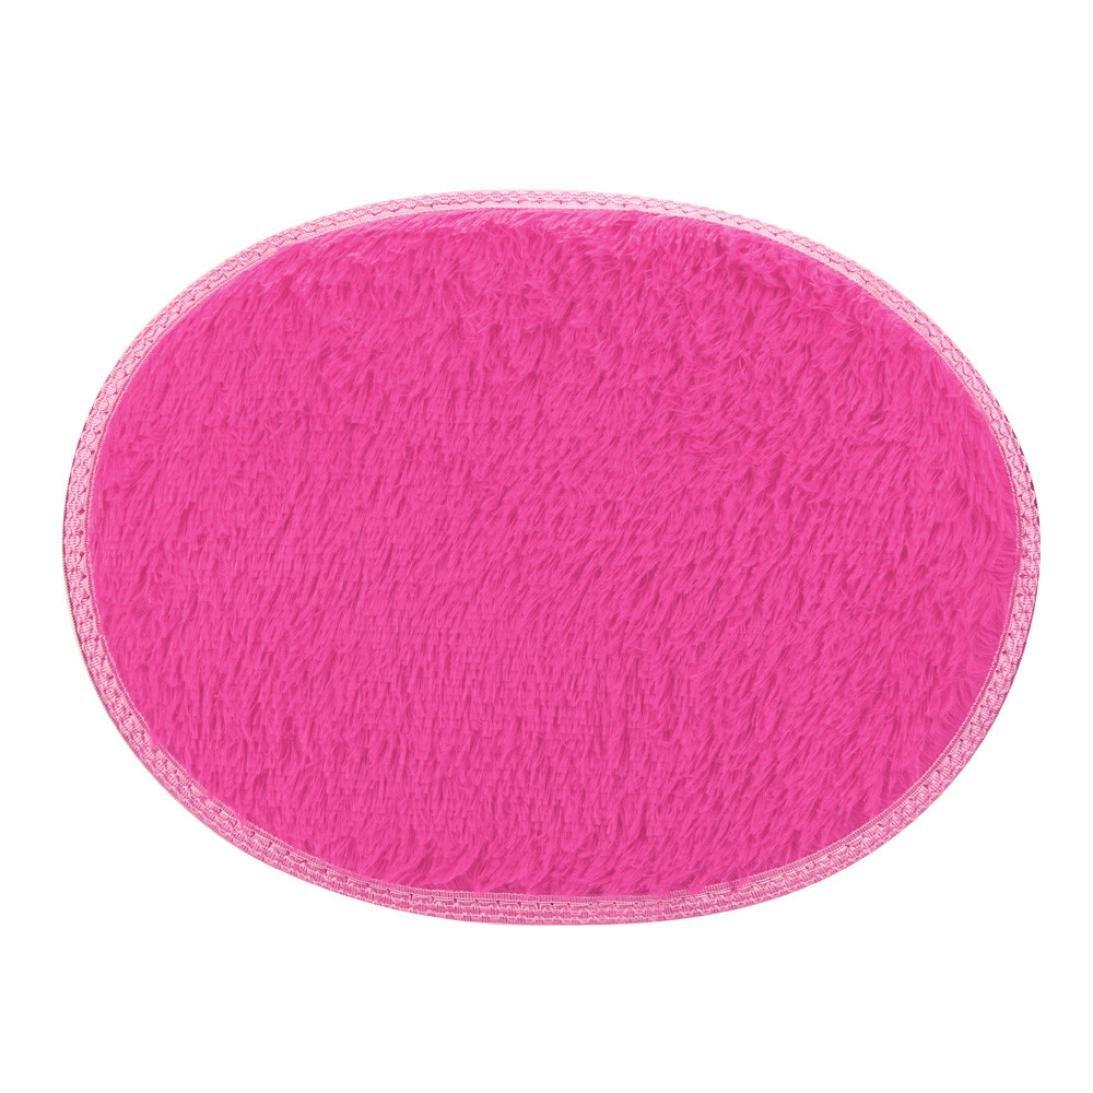 Tiean 30*40cm Anti-Skid Fluffy Shaggy Area Rug Home Bedroom Bathroom Floor Door Mat (Hot Pink)